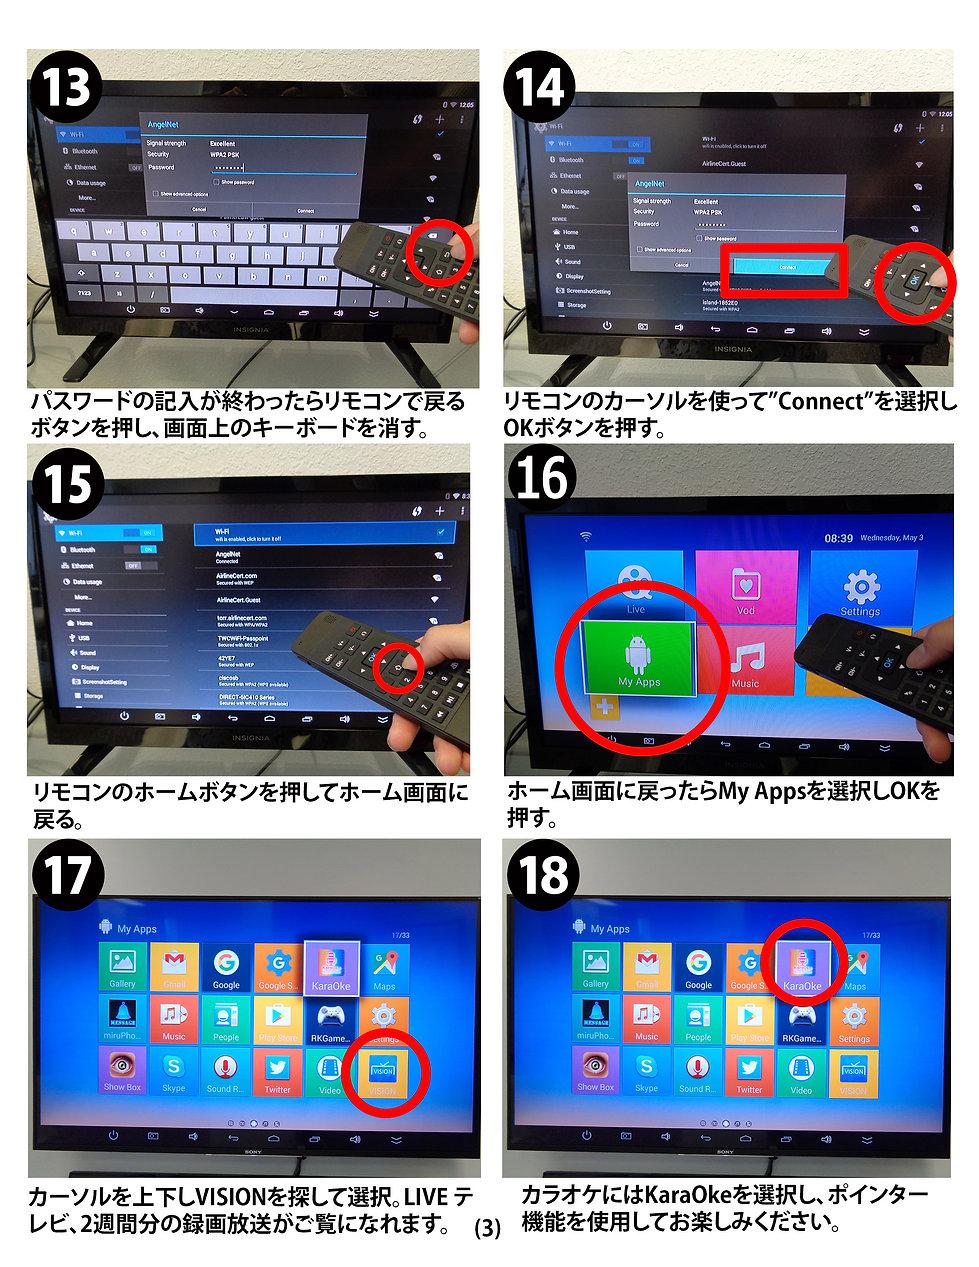 willfon-K set up3.jpg